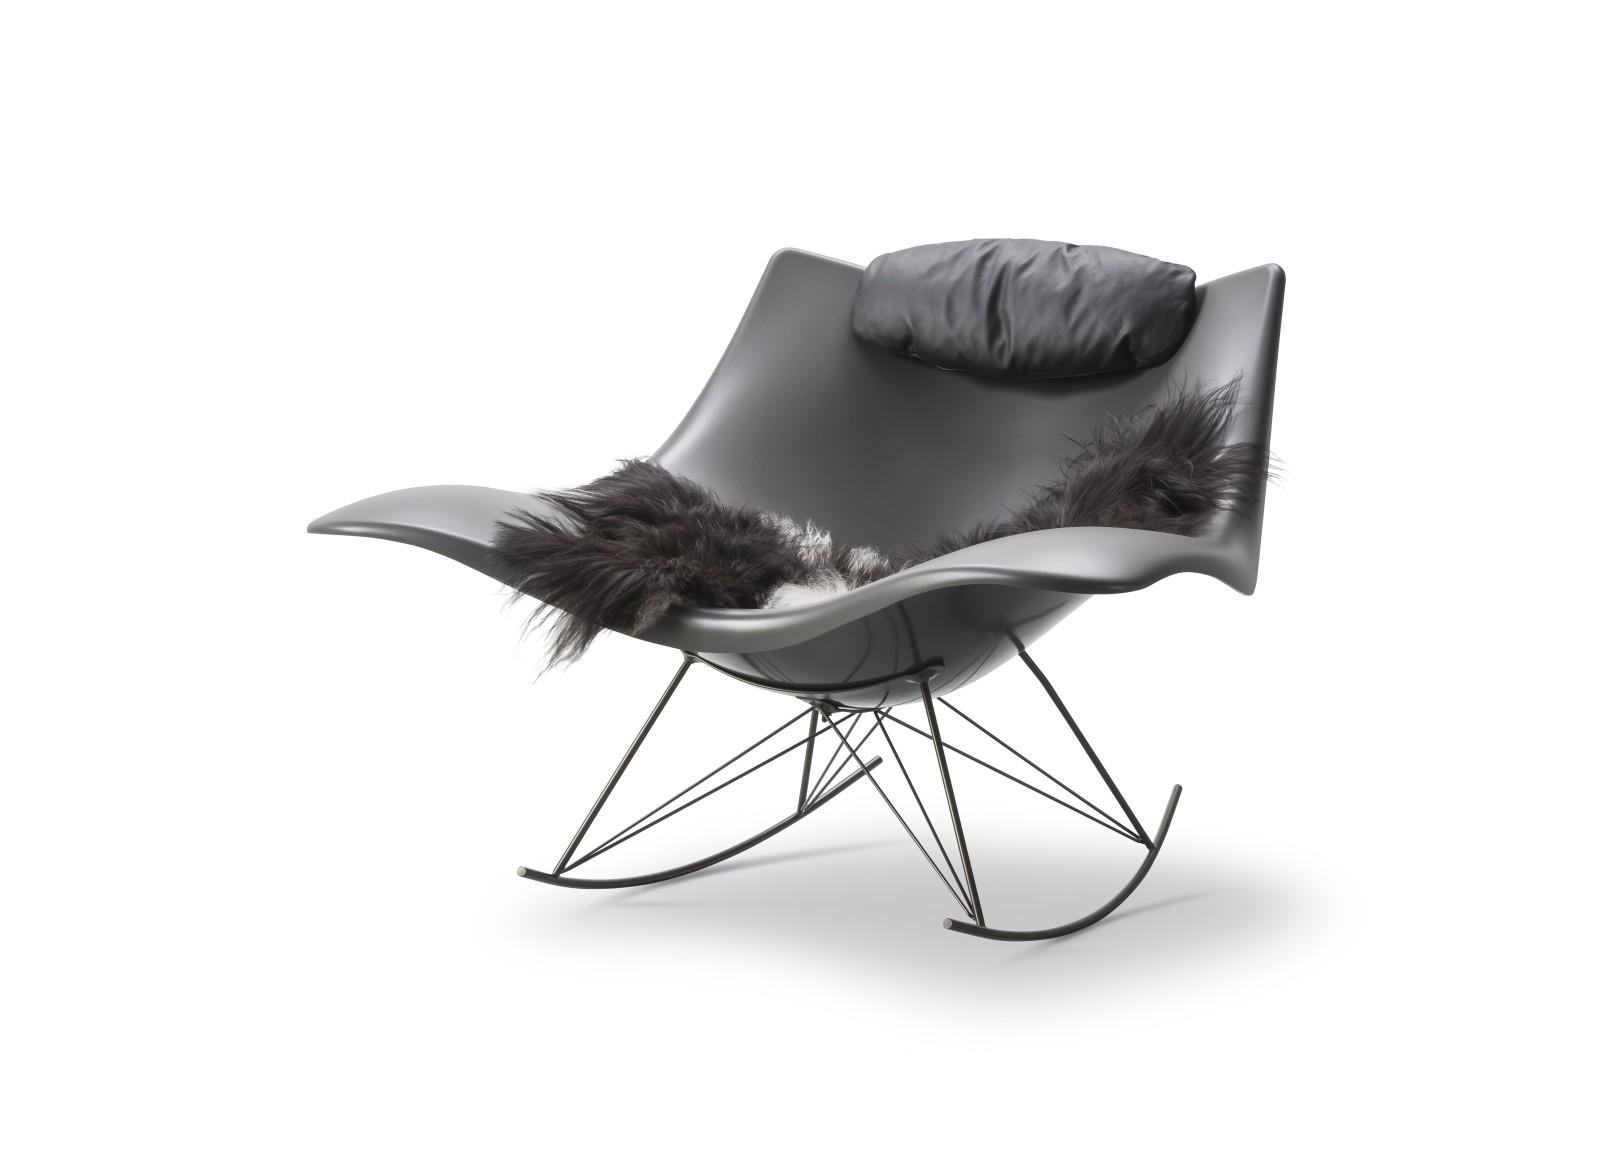 Neck cushion Stingray Stingray fabric Stripes